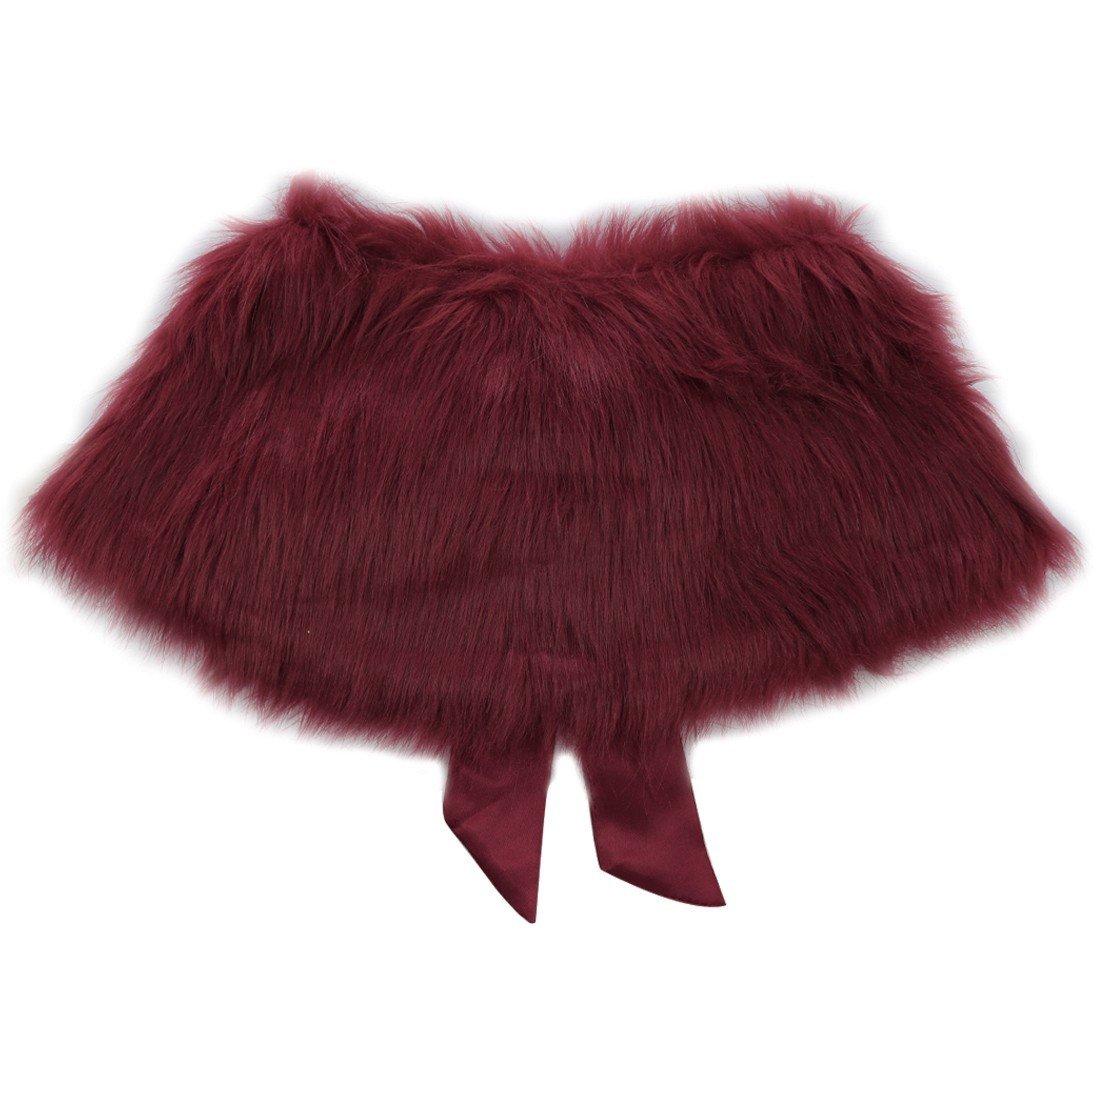 FEESHOW Flower Girls Faux Fur Wedding Shawl Wrap Stole Princess Shoulder Cape Bolero Shrug Burgundy one size